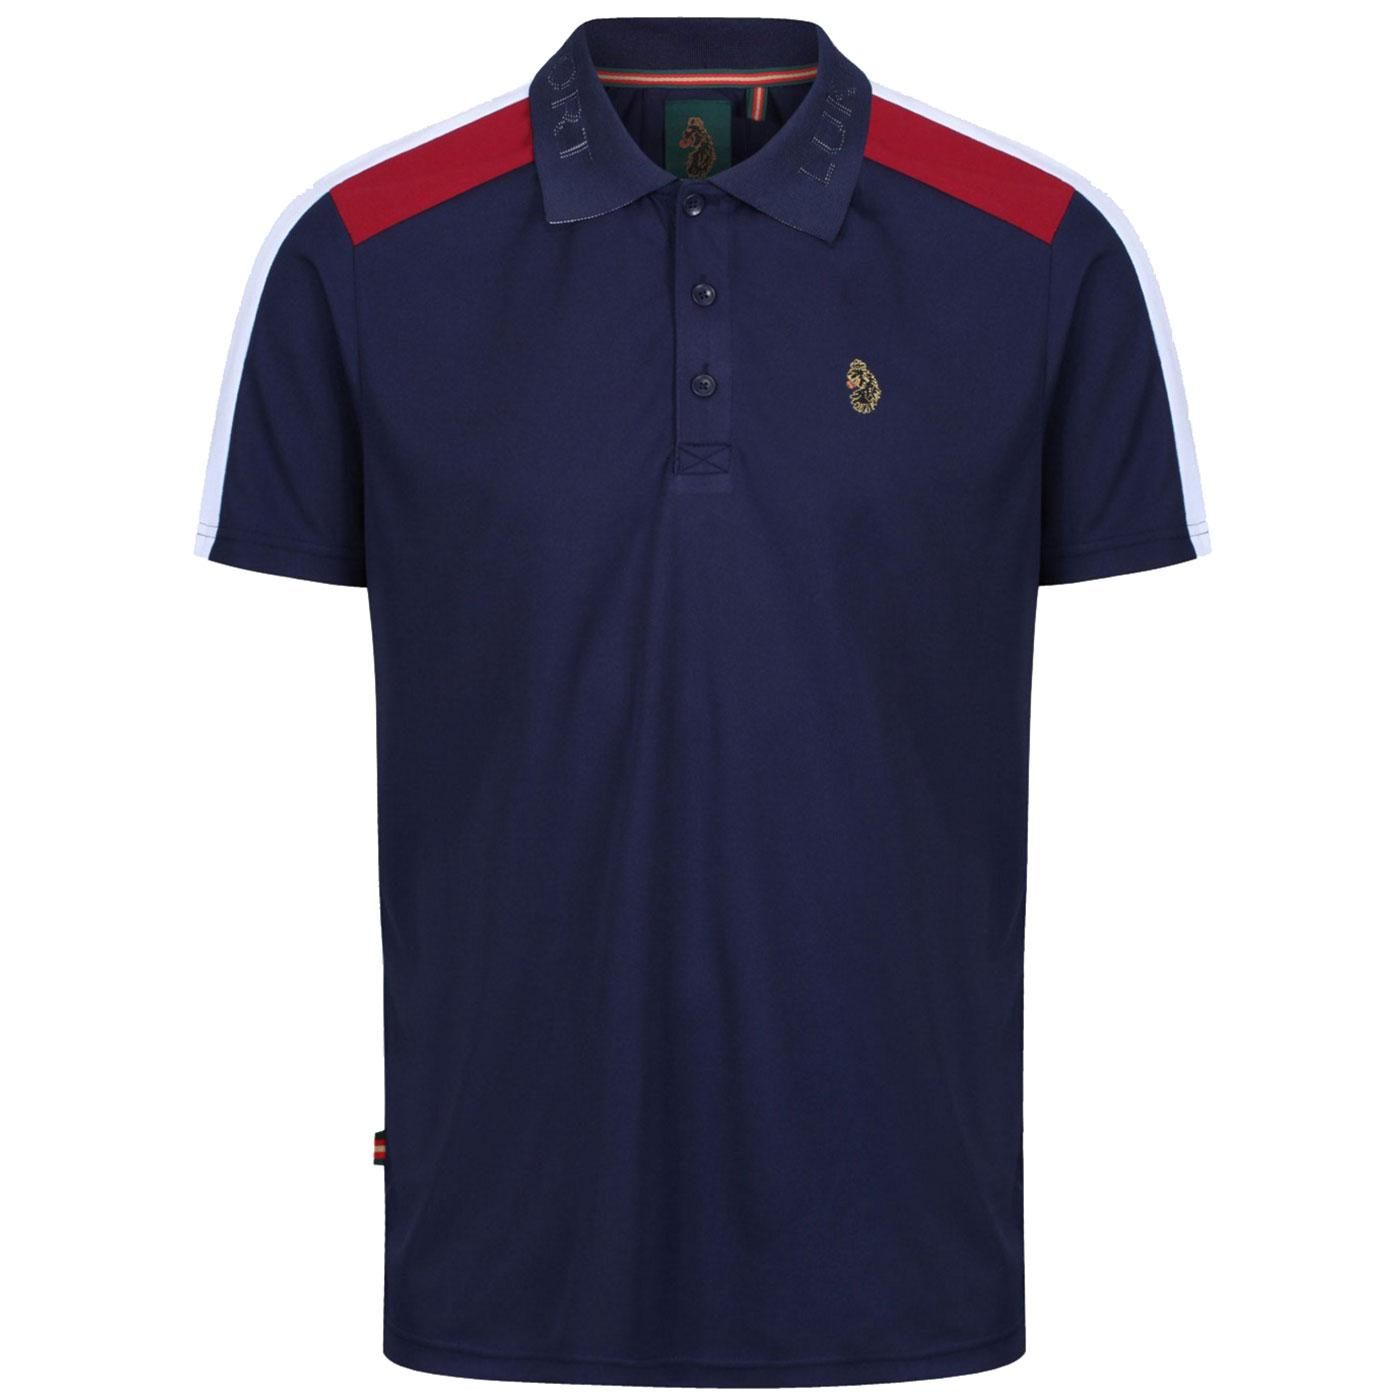 Spinna LUKE SPORT Men's Jacquard Text Polo Shirt